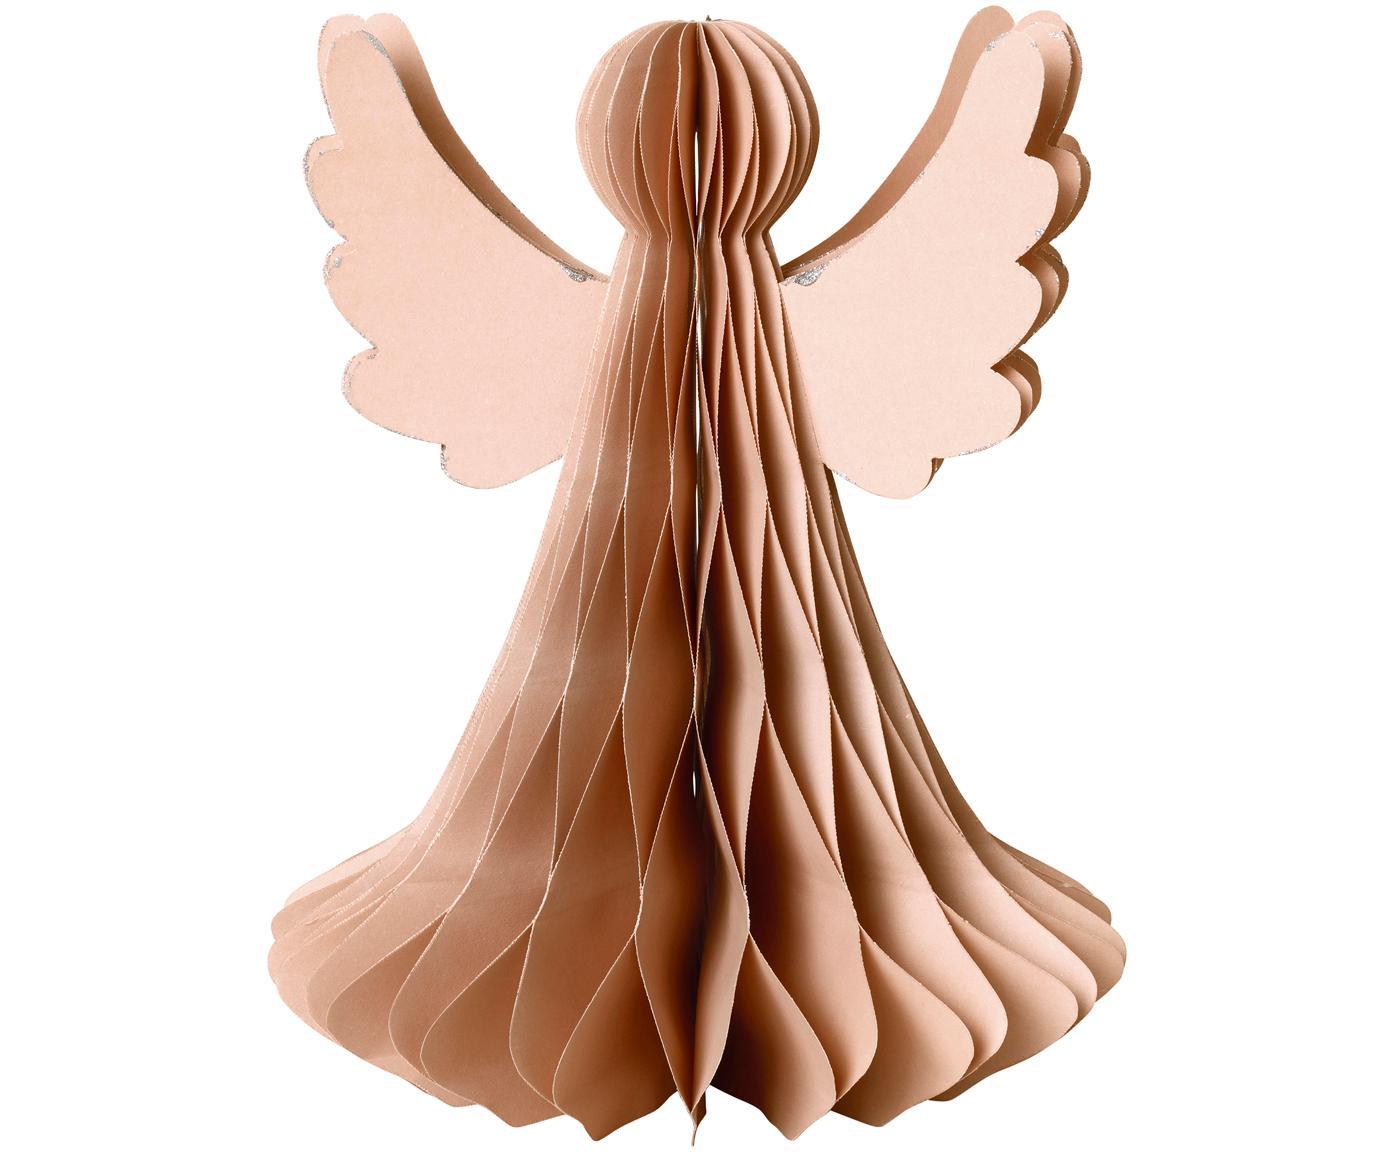 XL Deko-Objekt Angel, Papier, Altrosa, Ø 21 x H 27 cm